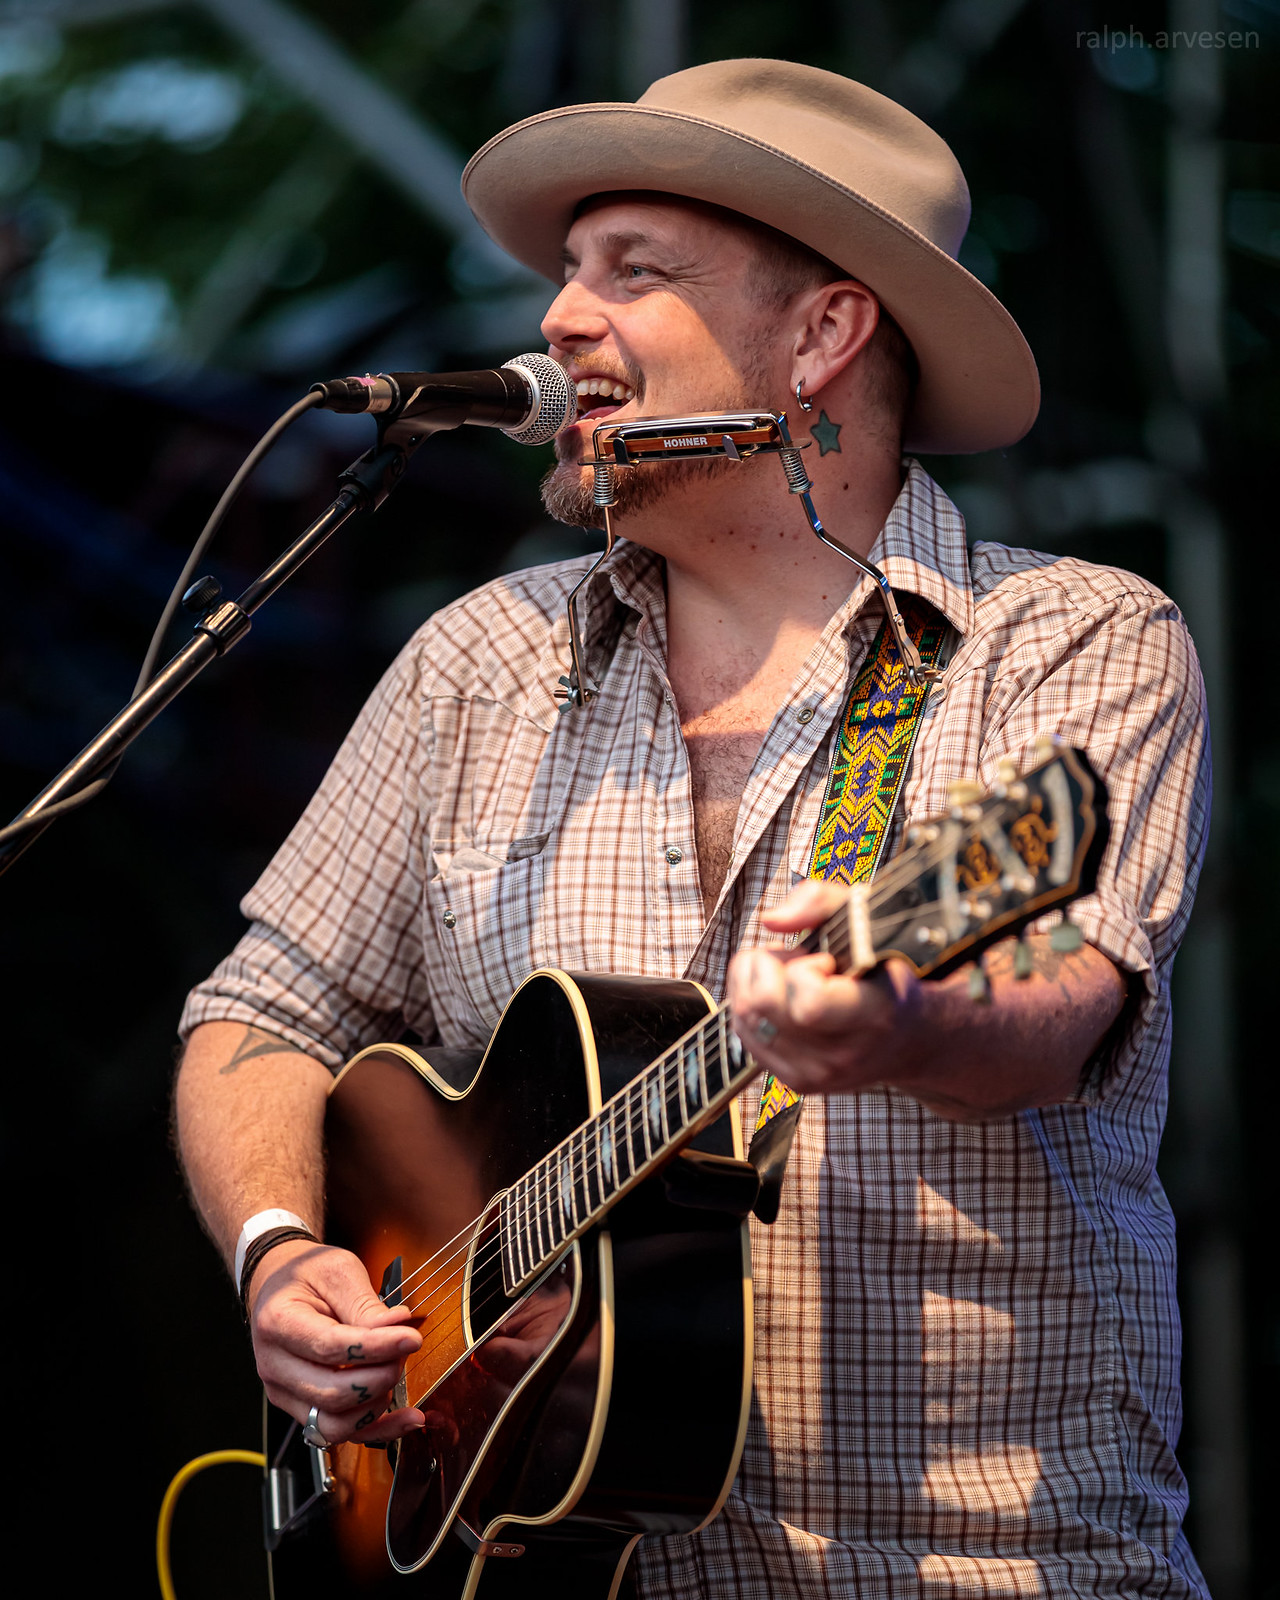 Graham Wilkinson | Texas Review | Ralph Arvesen